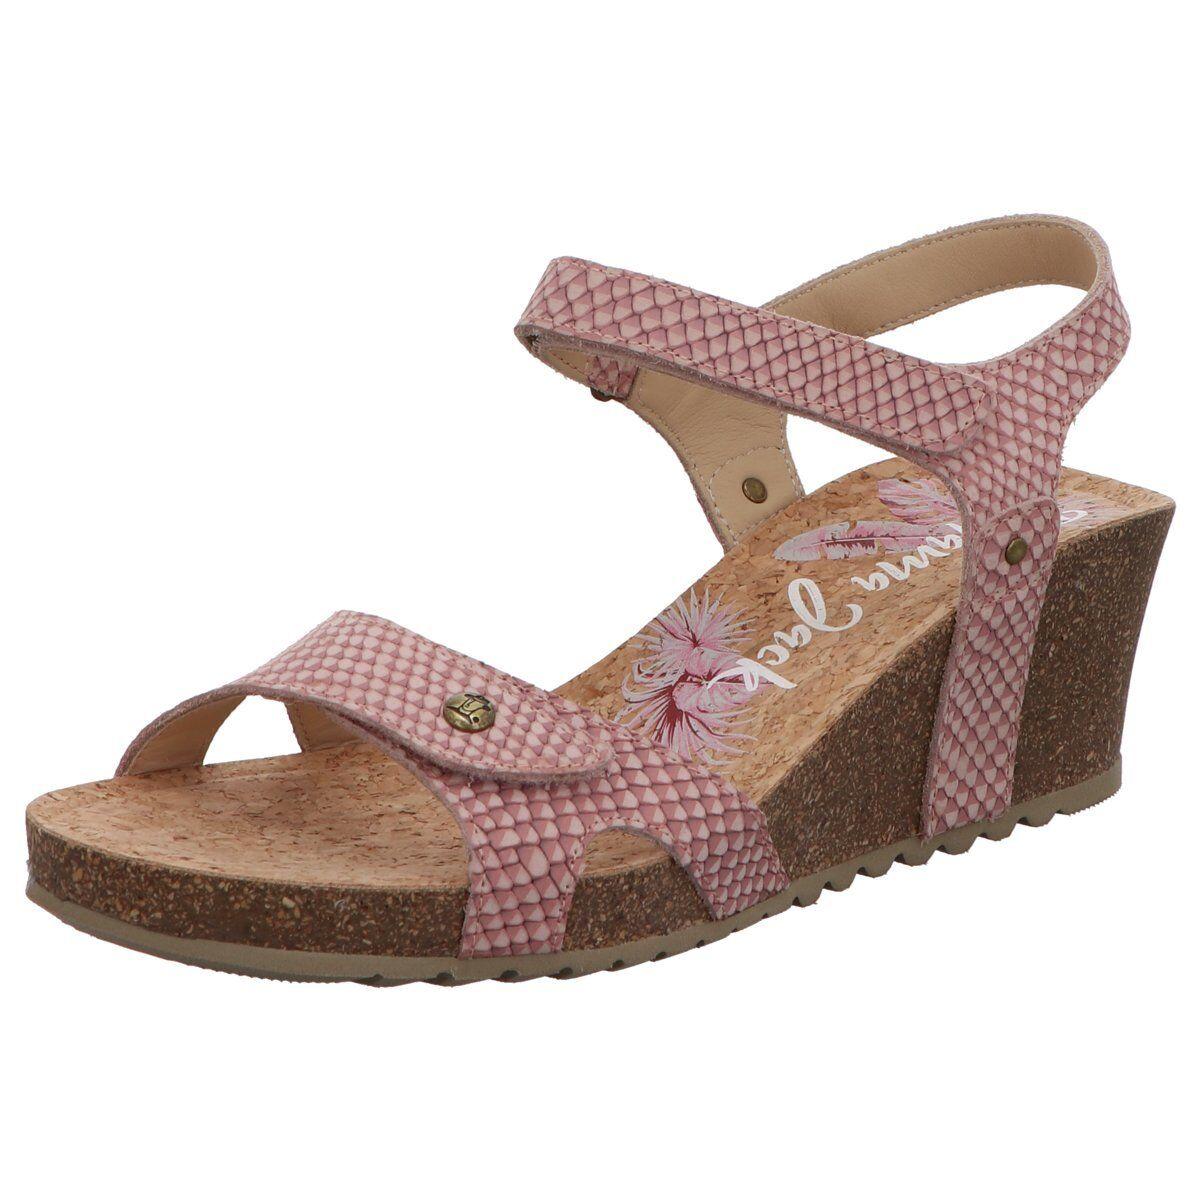 NEU Panama Jack Damen Sandaletten -11 Julia Snake B14 rosa 446422